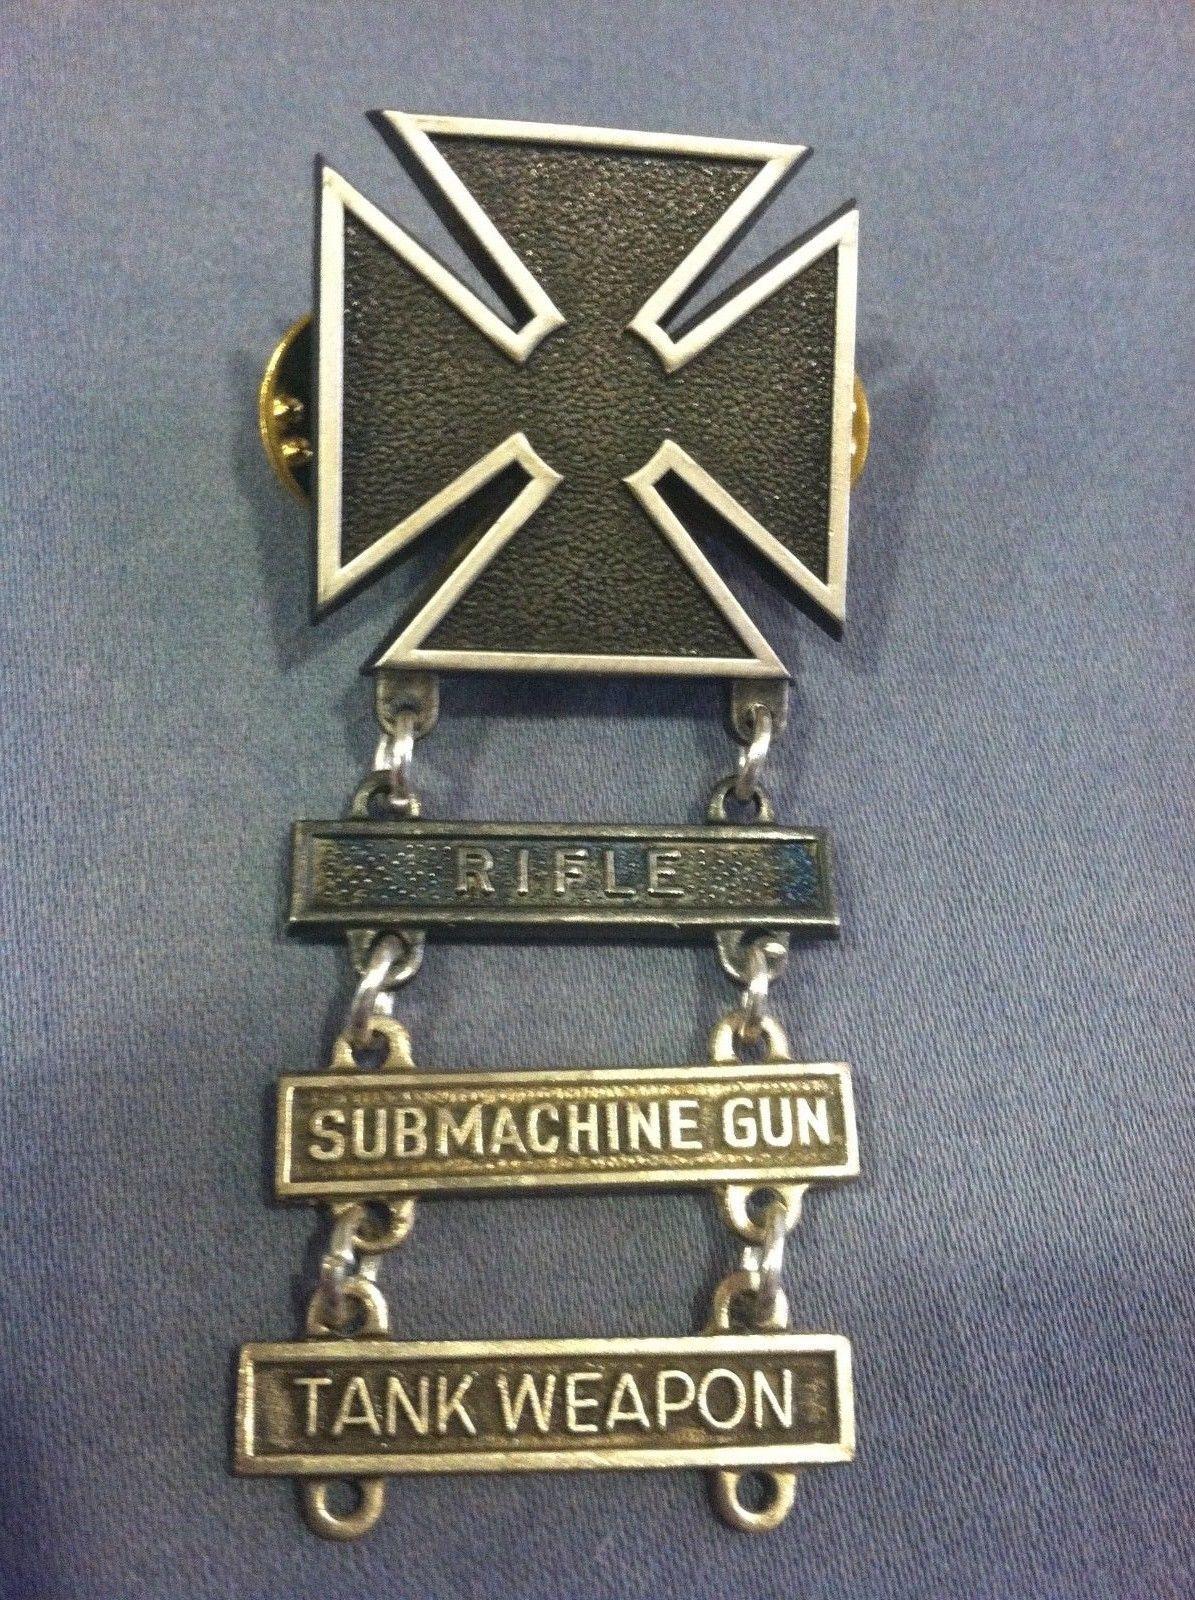 45e7080726b1 WWII Marksman Badge Pin Rifle Submachine Gun Tank Weapon Army Medal  Military Set | eBay